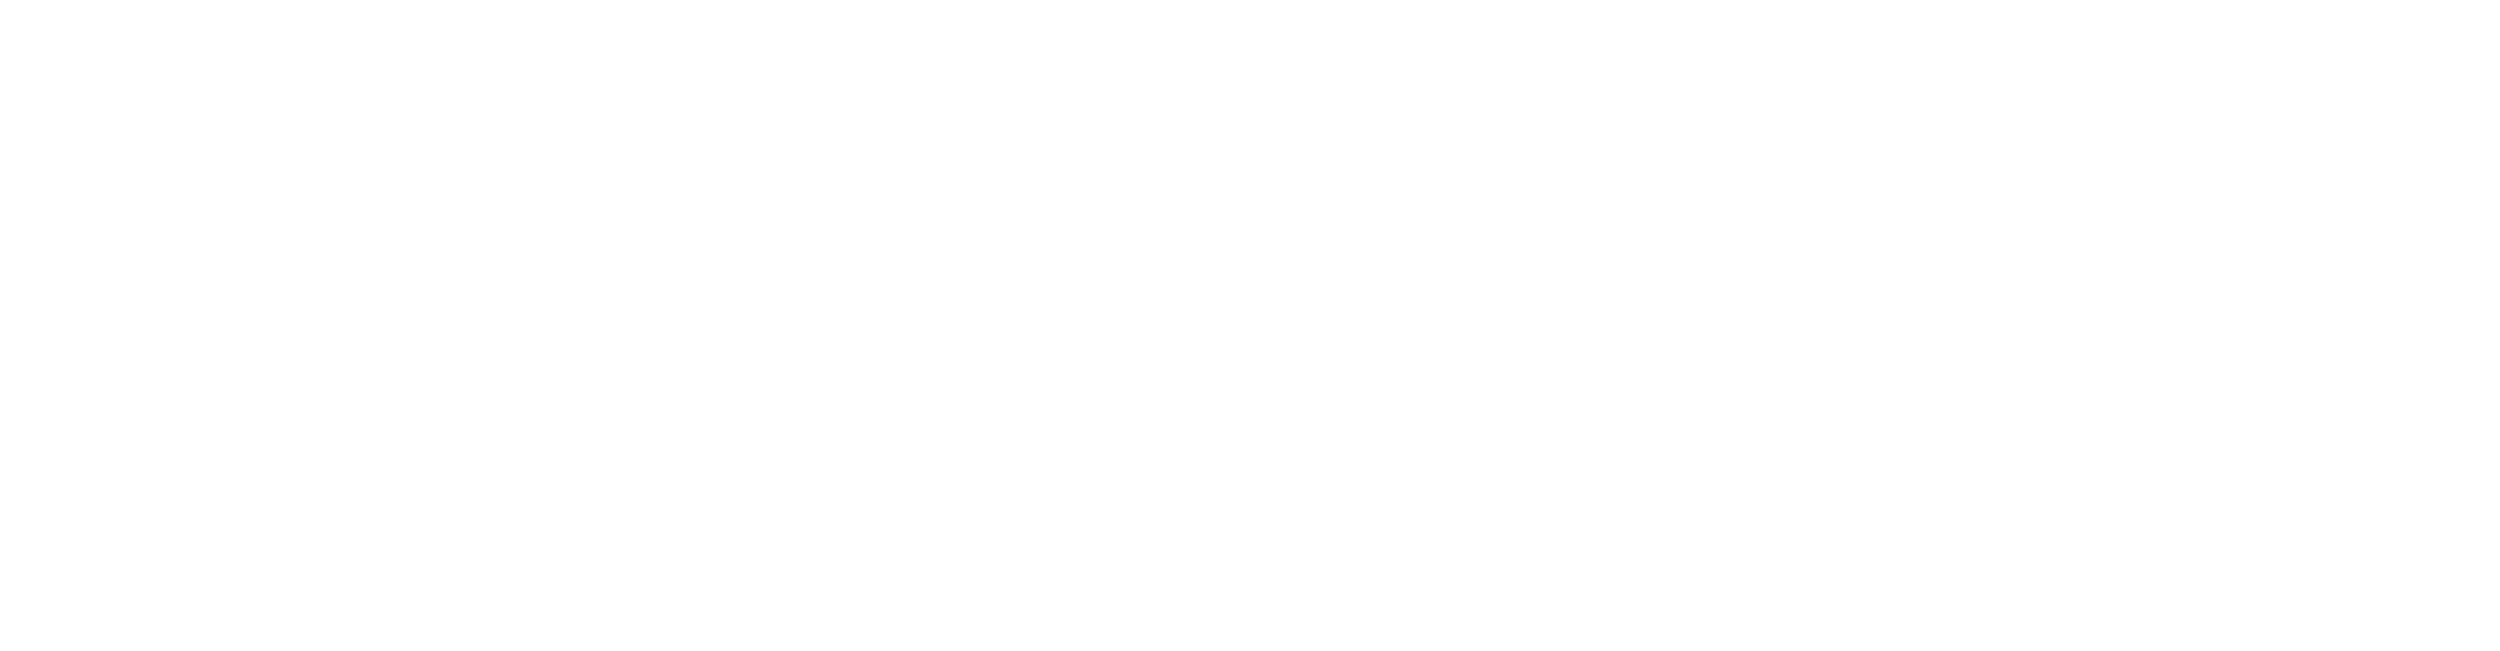 Threshold_Logo_Wht.png